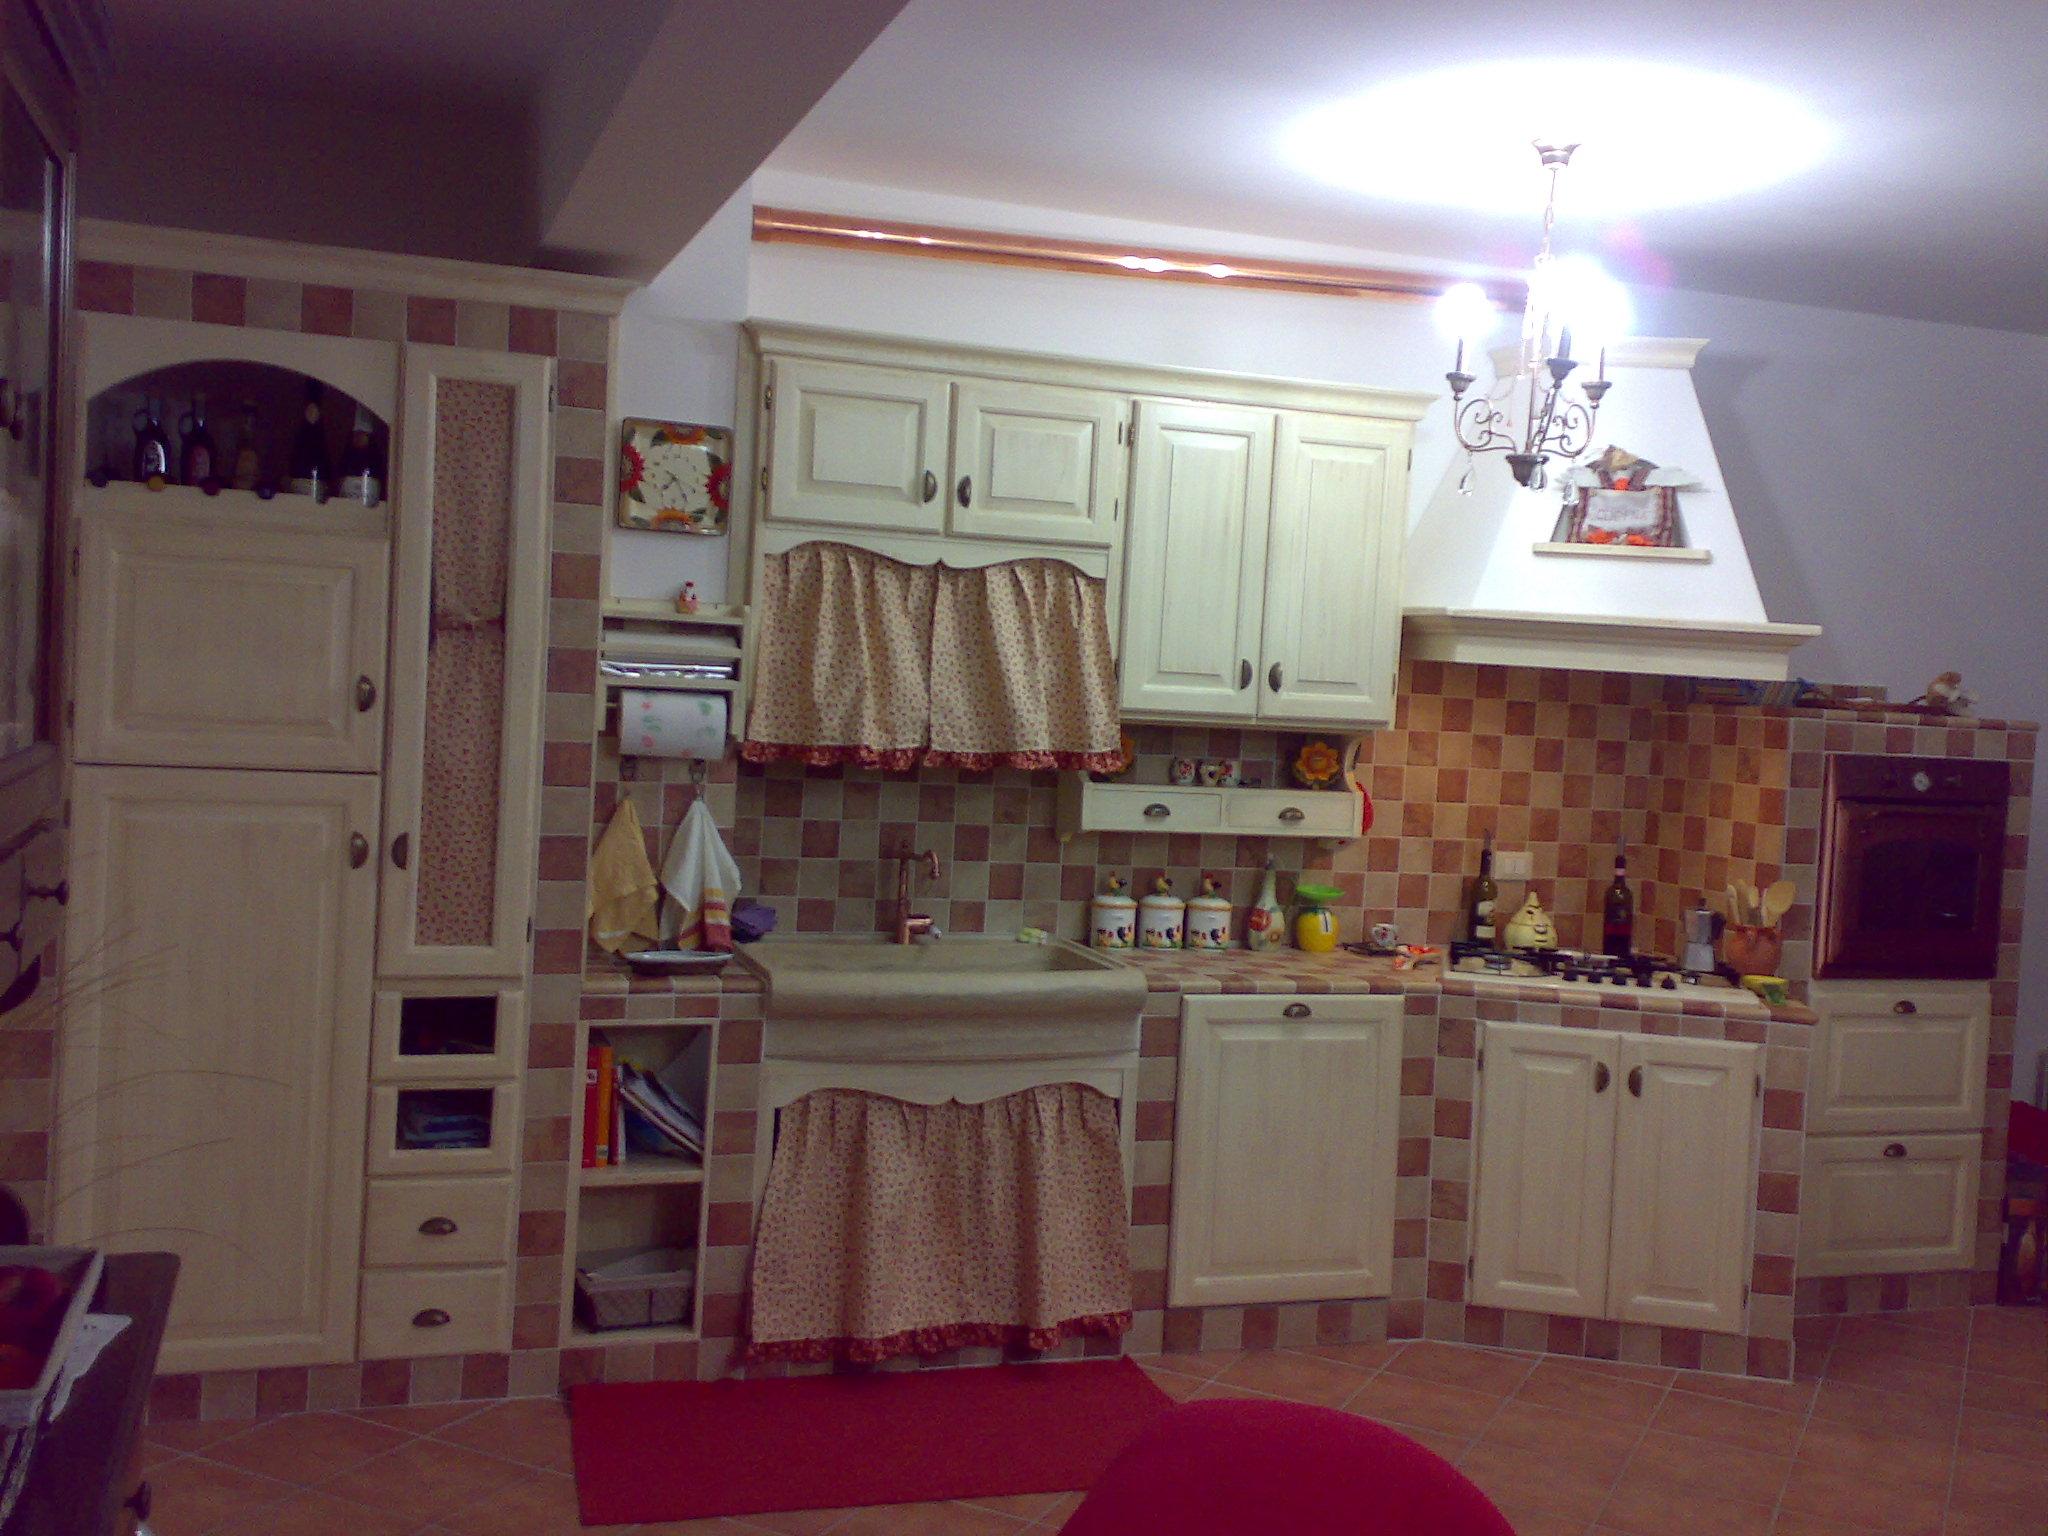 Cucina Emanuela Cucina In Muratura Patinata Crema Ma Disponibile In  #40242D 2048 1536 Rivestimenti Cucina Con Disegni